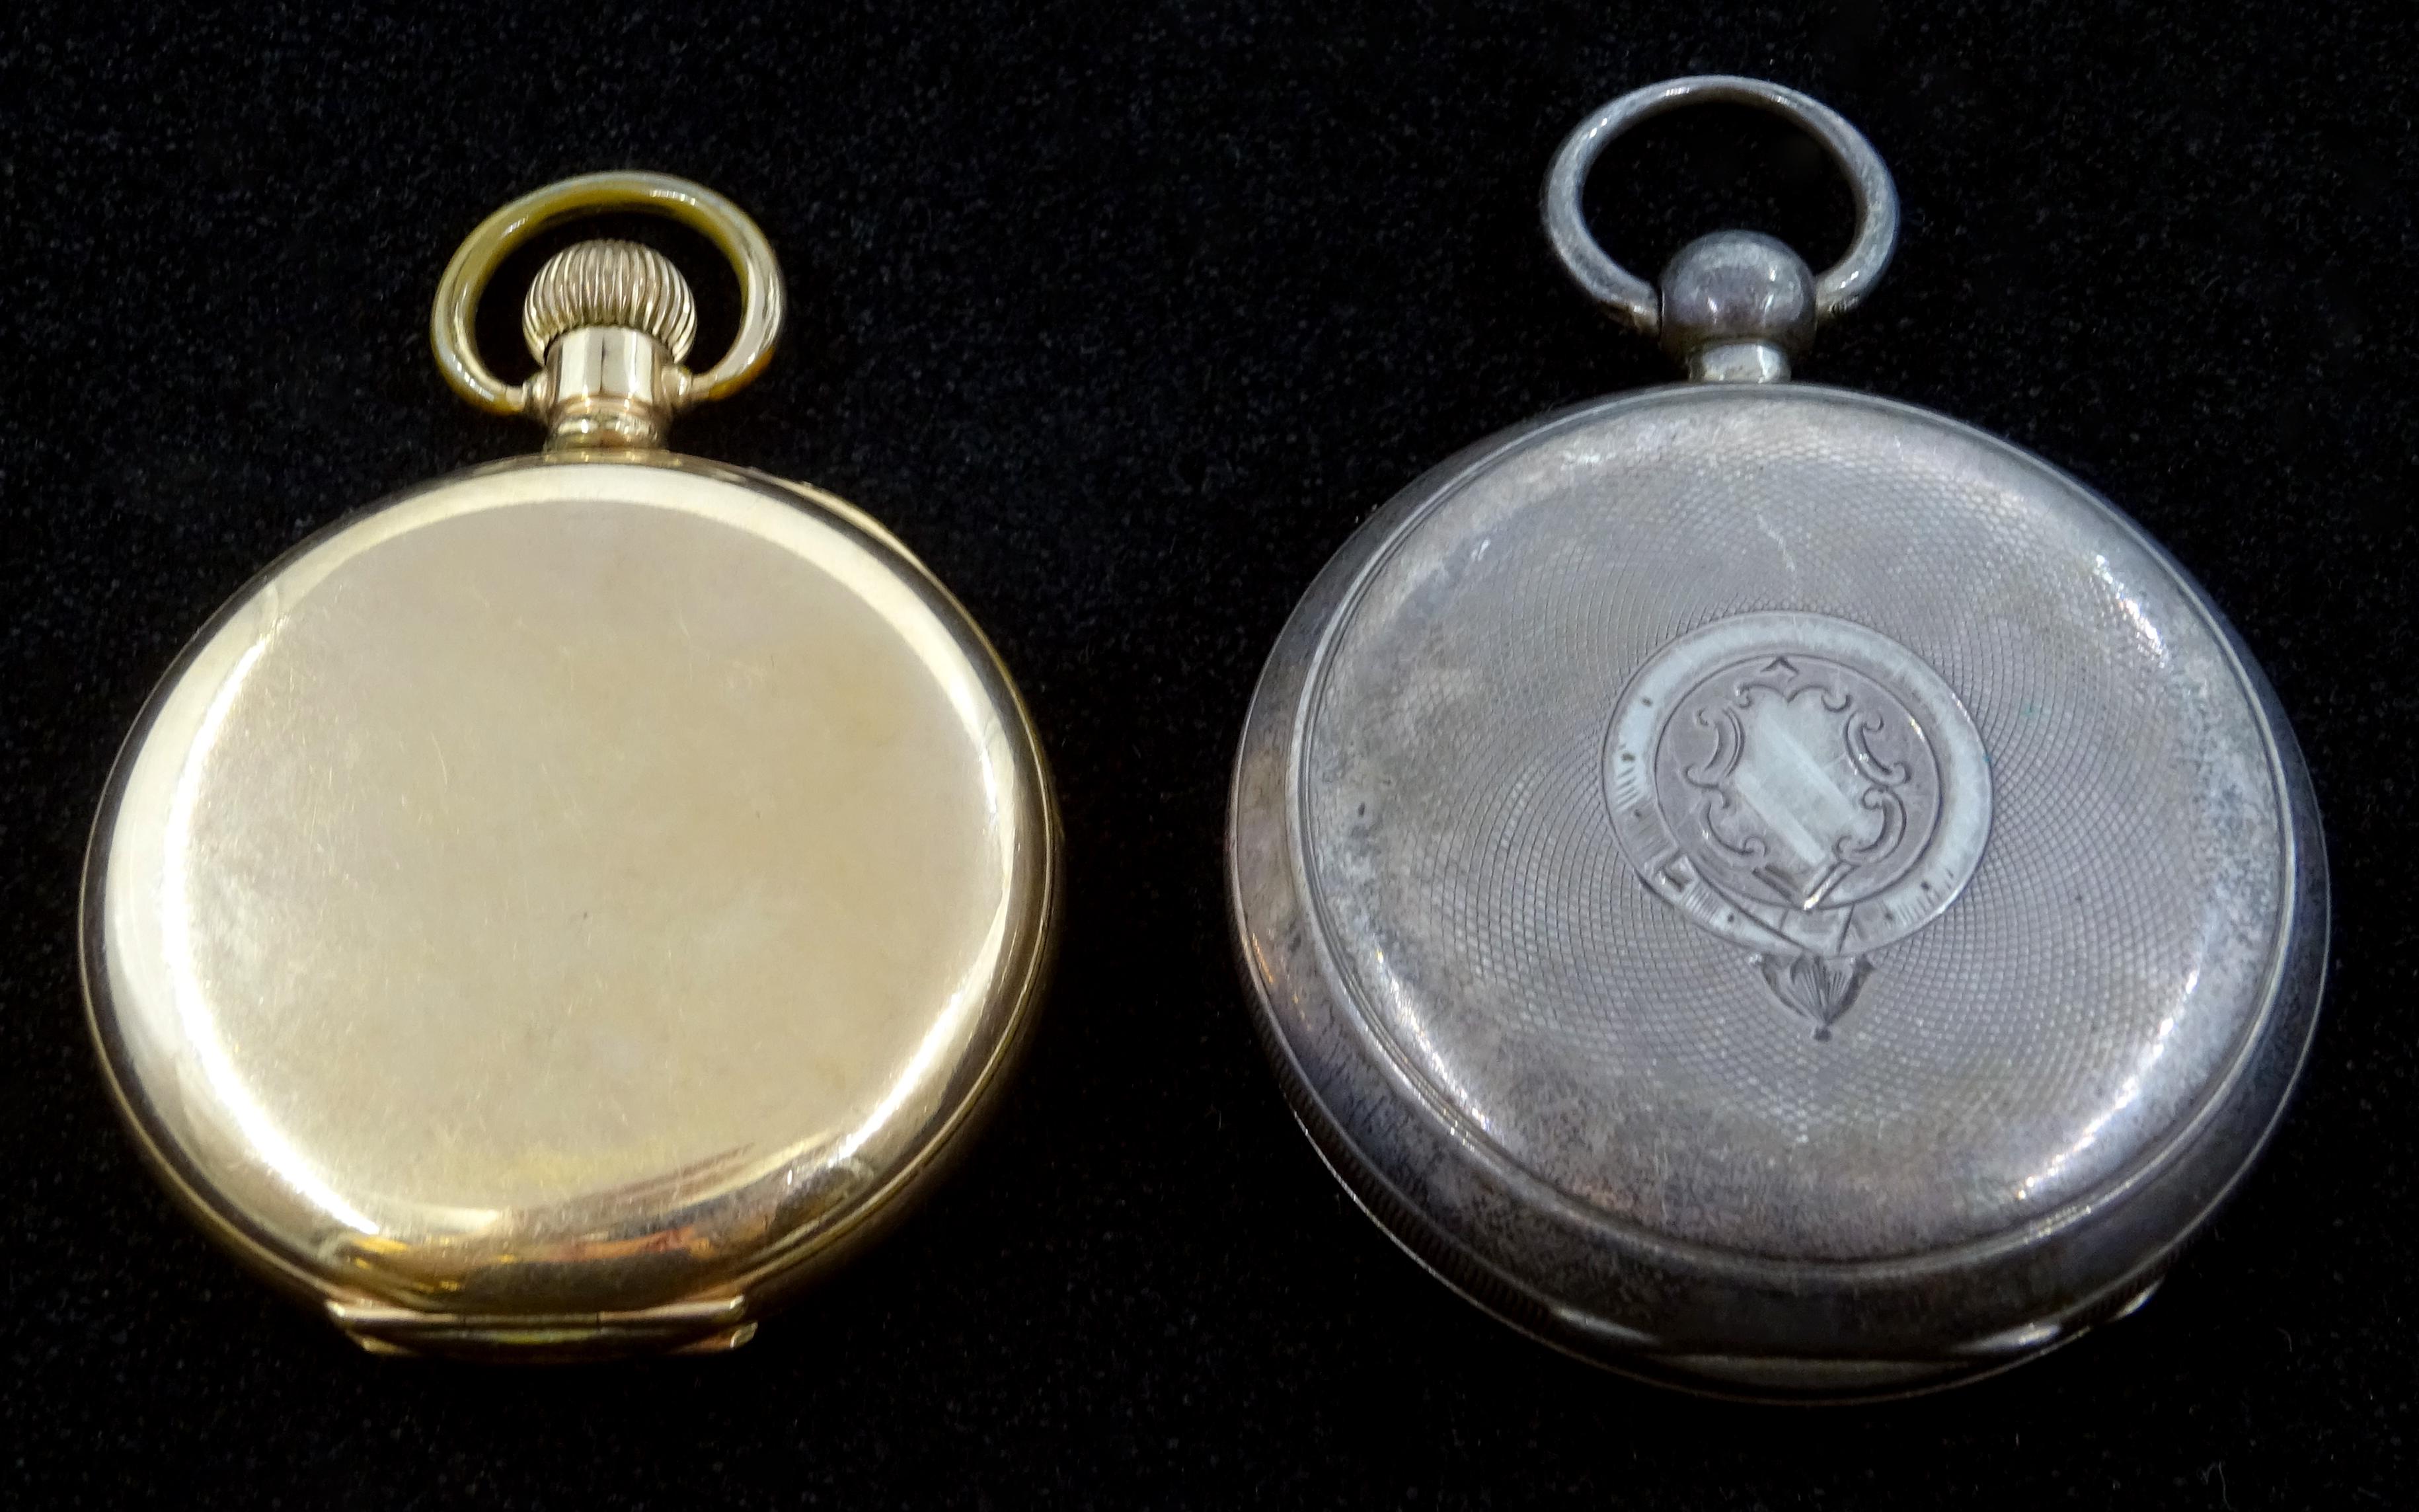 Lot 1160 - Victorian silver pocket watch, key wound by Waltham Mass,